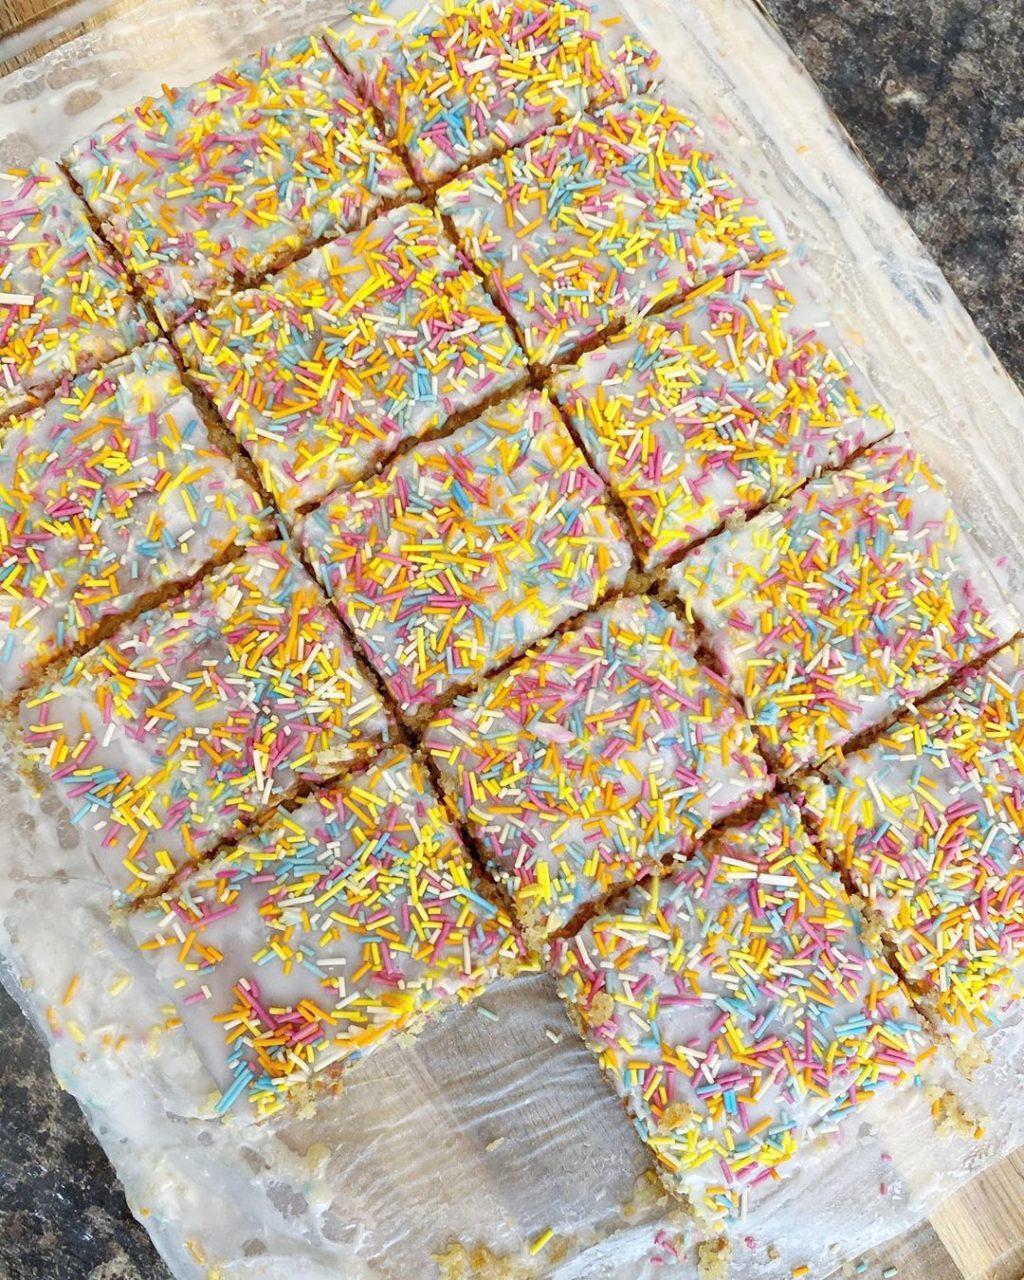 Sprinkle Tray Bake